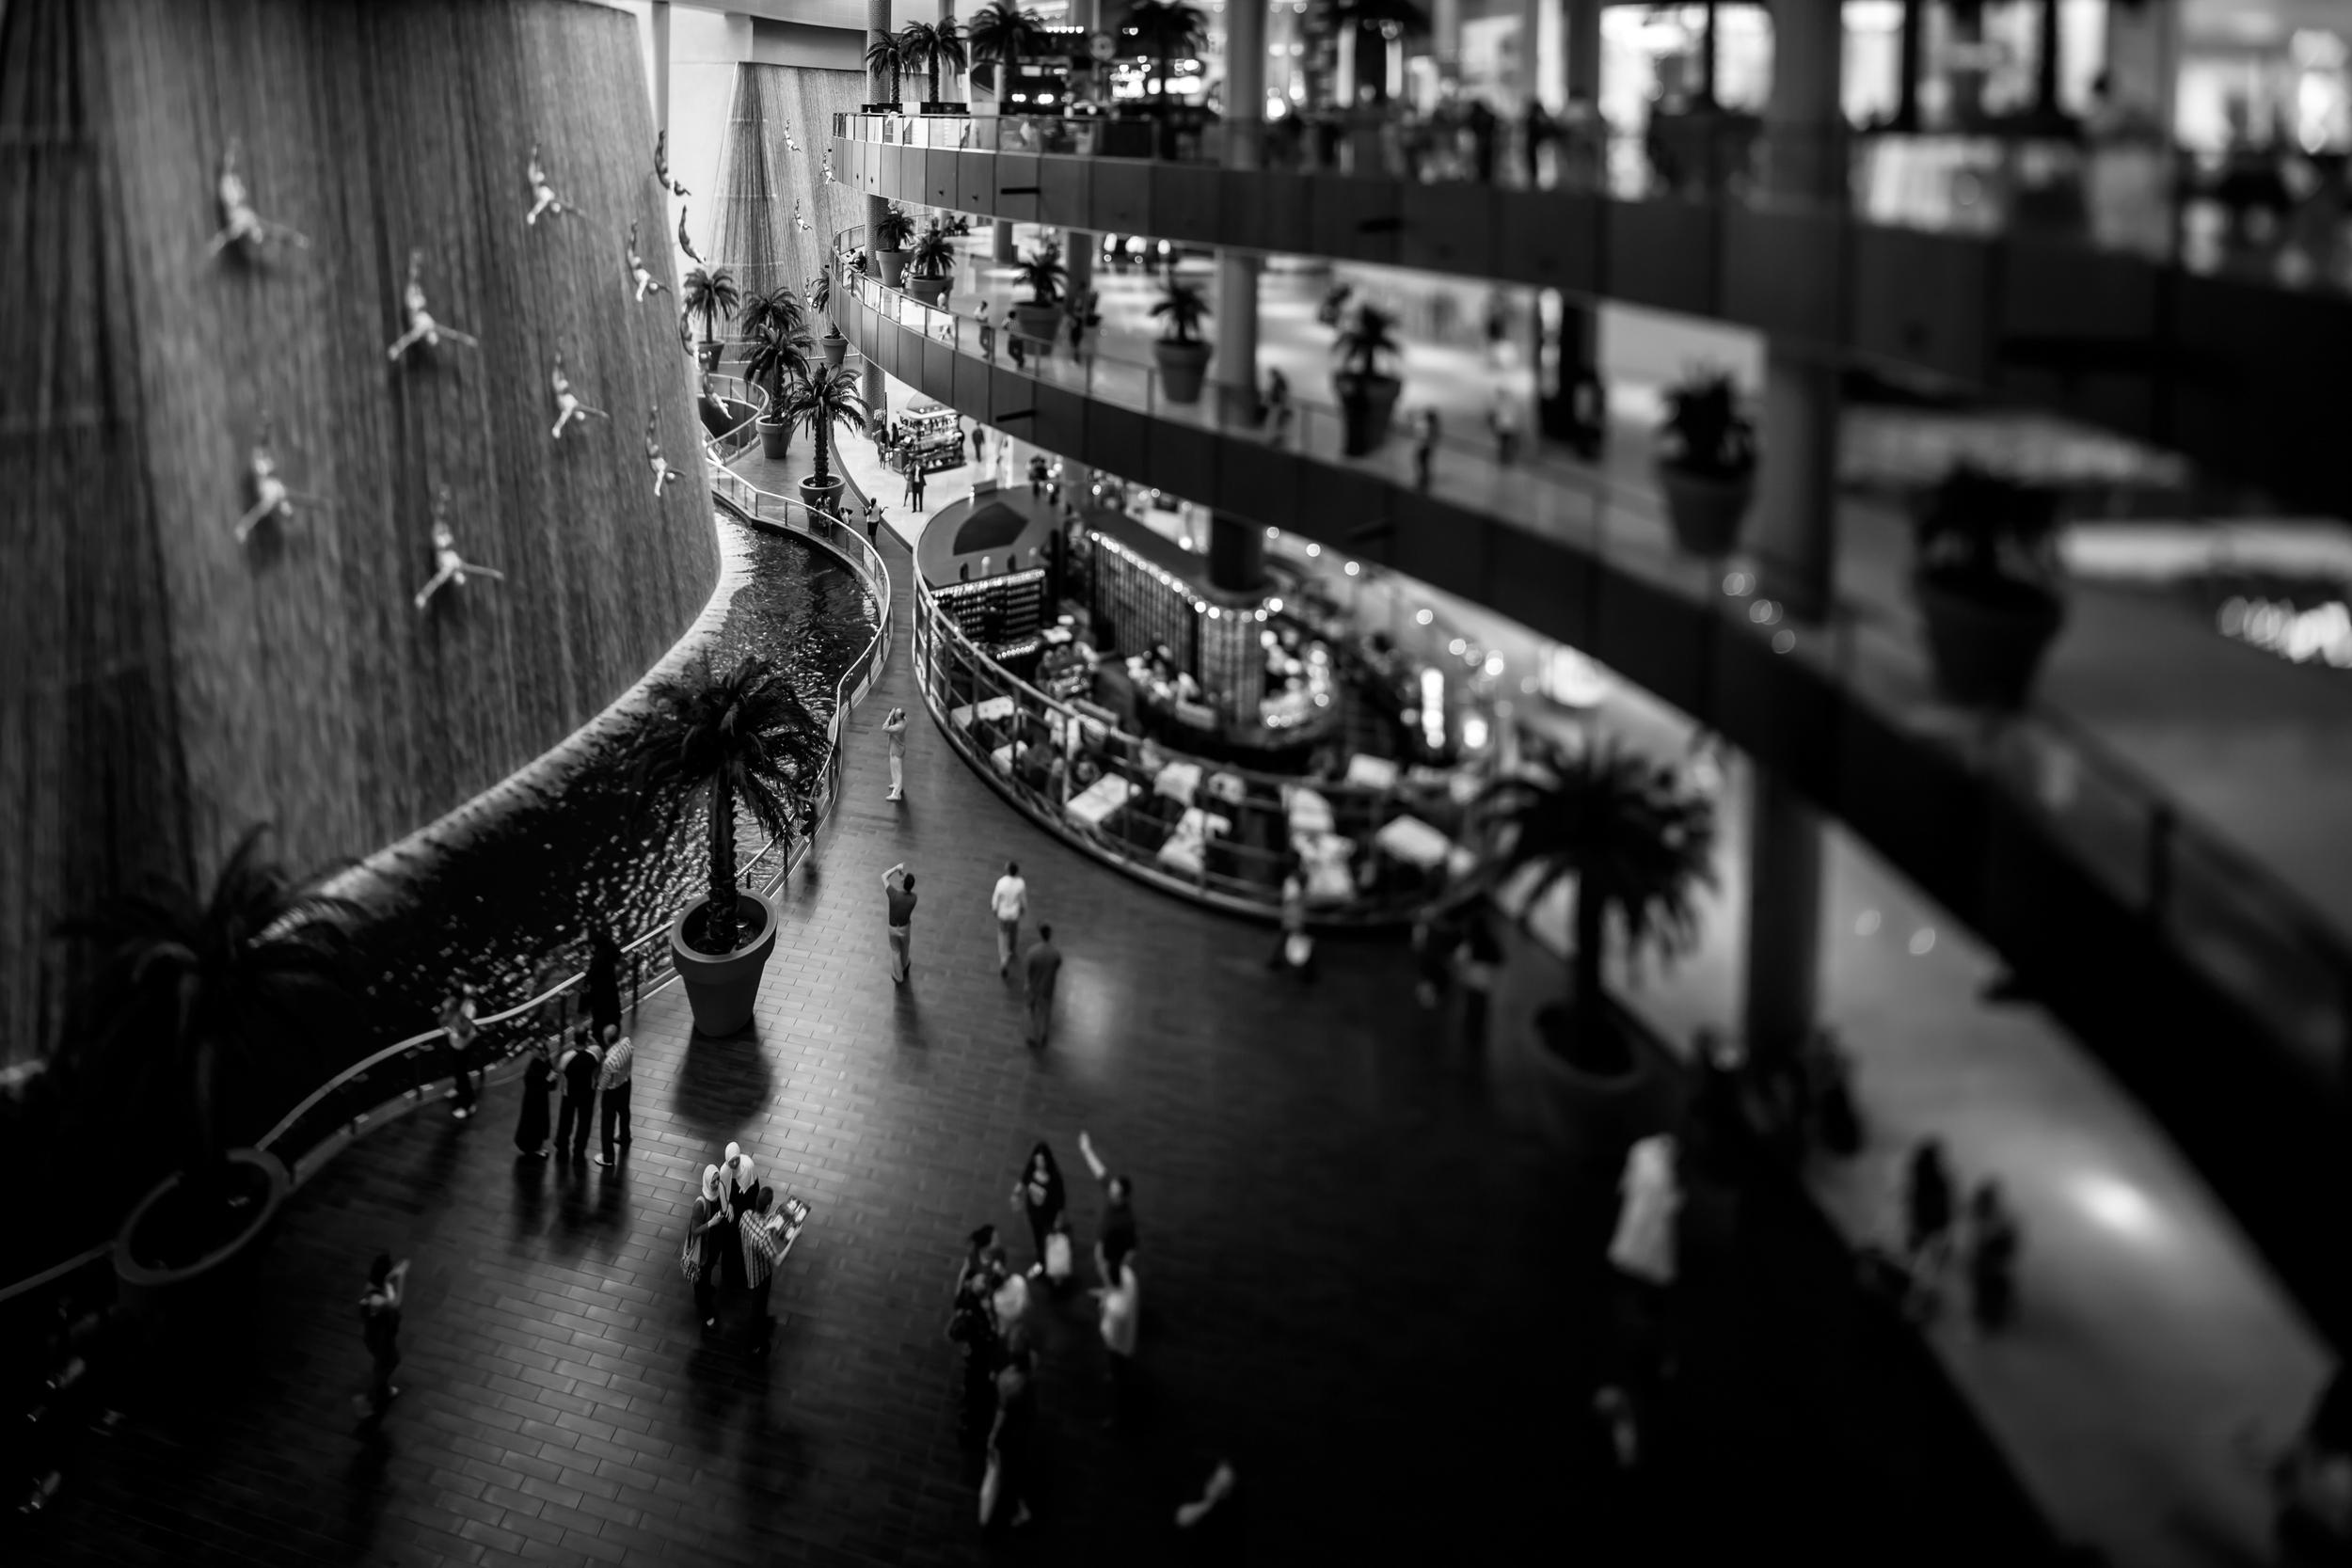 The Waterfall at the Dubai Mall (17mm TS-E